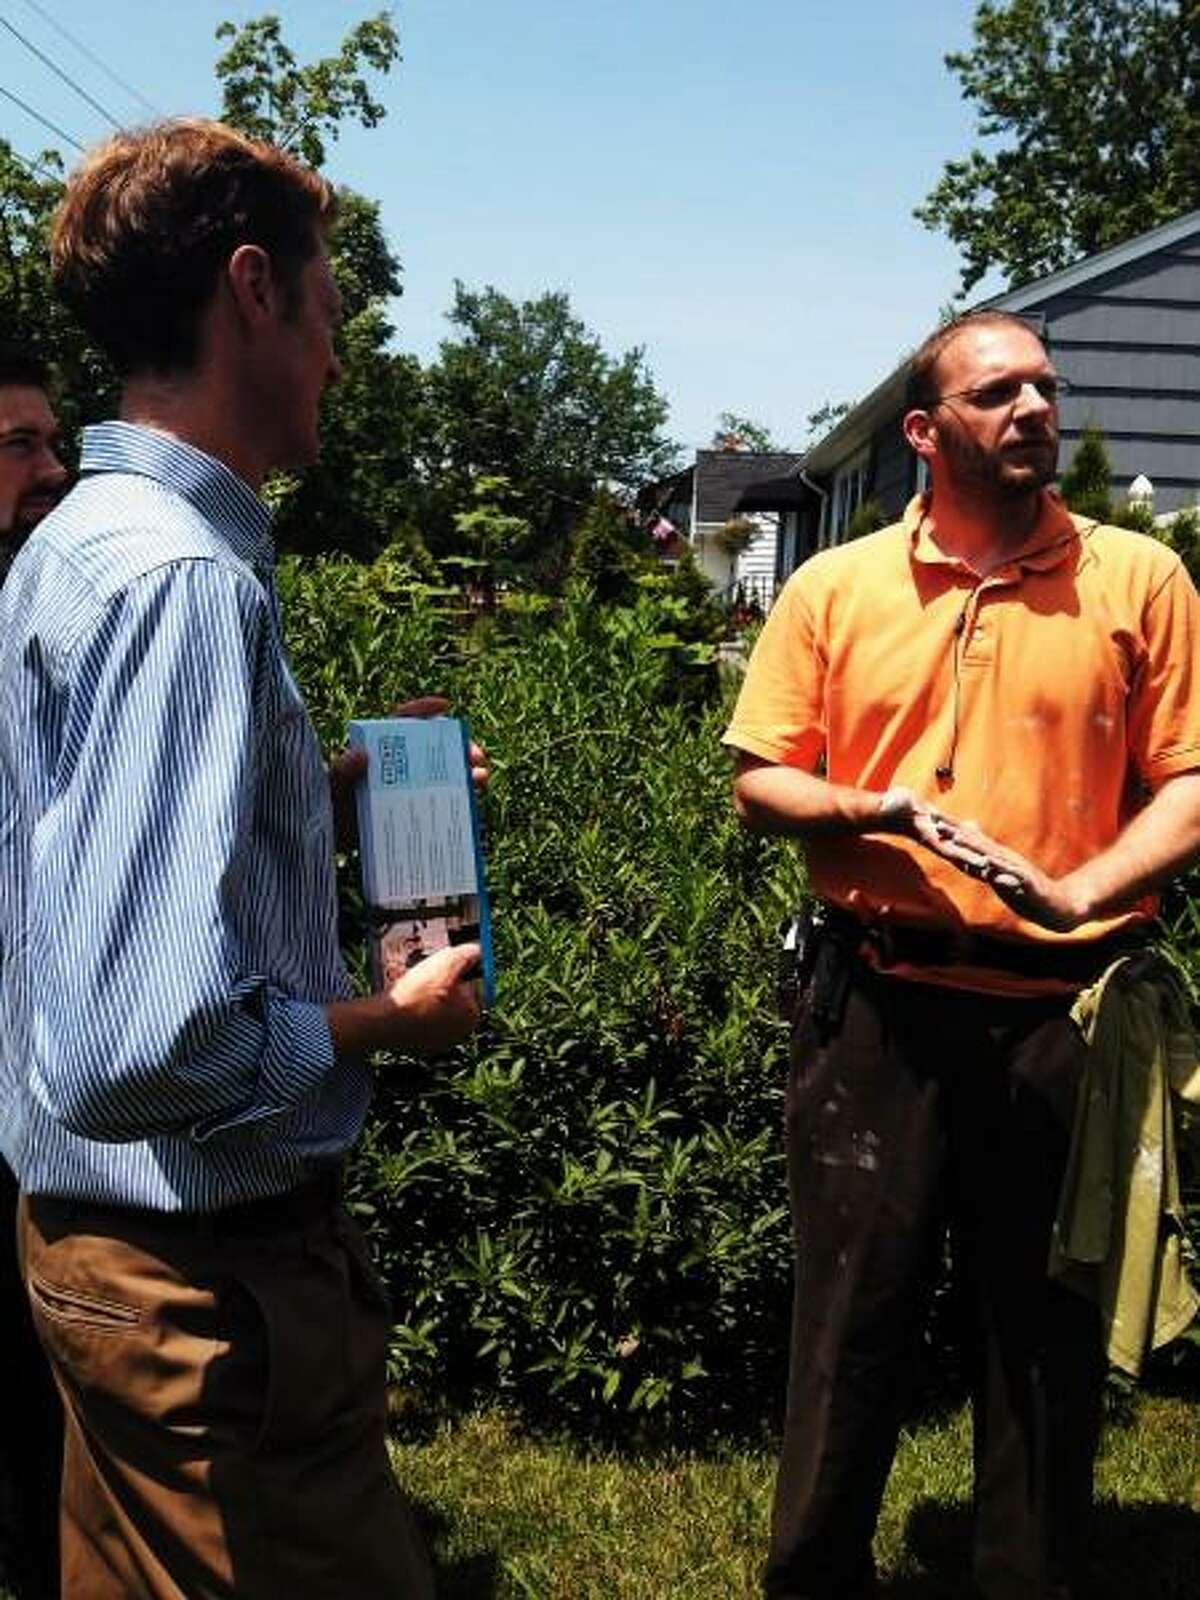 Elicker Justin Elicker talks to East Shore resident Ben Yousey-Hindes. New Haven Register.